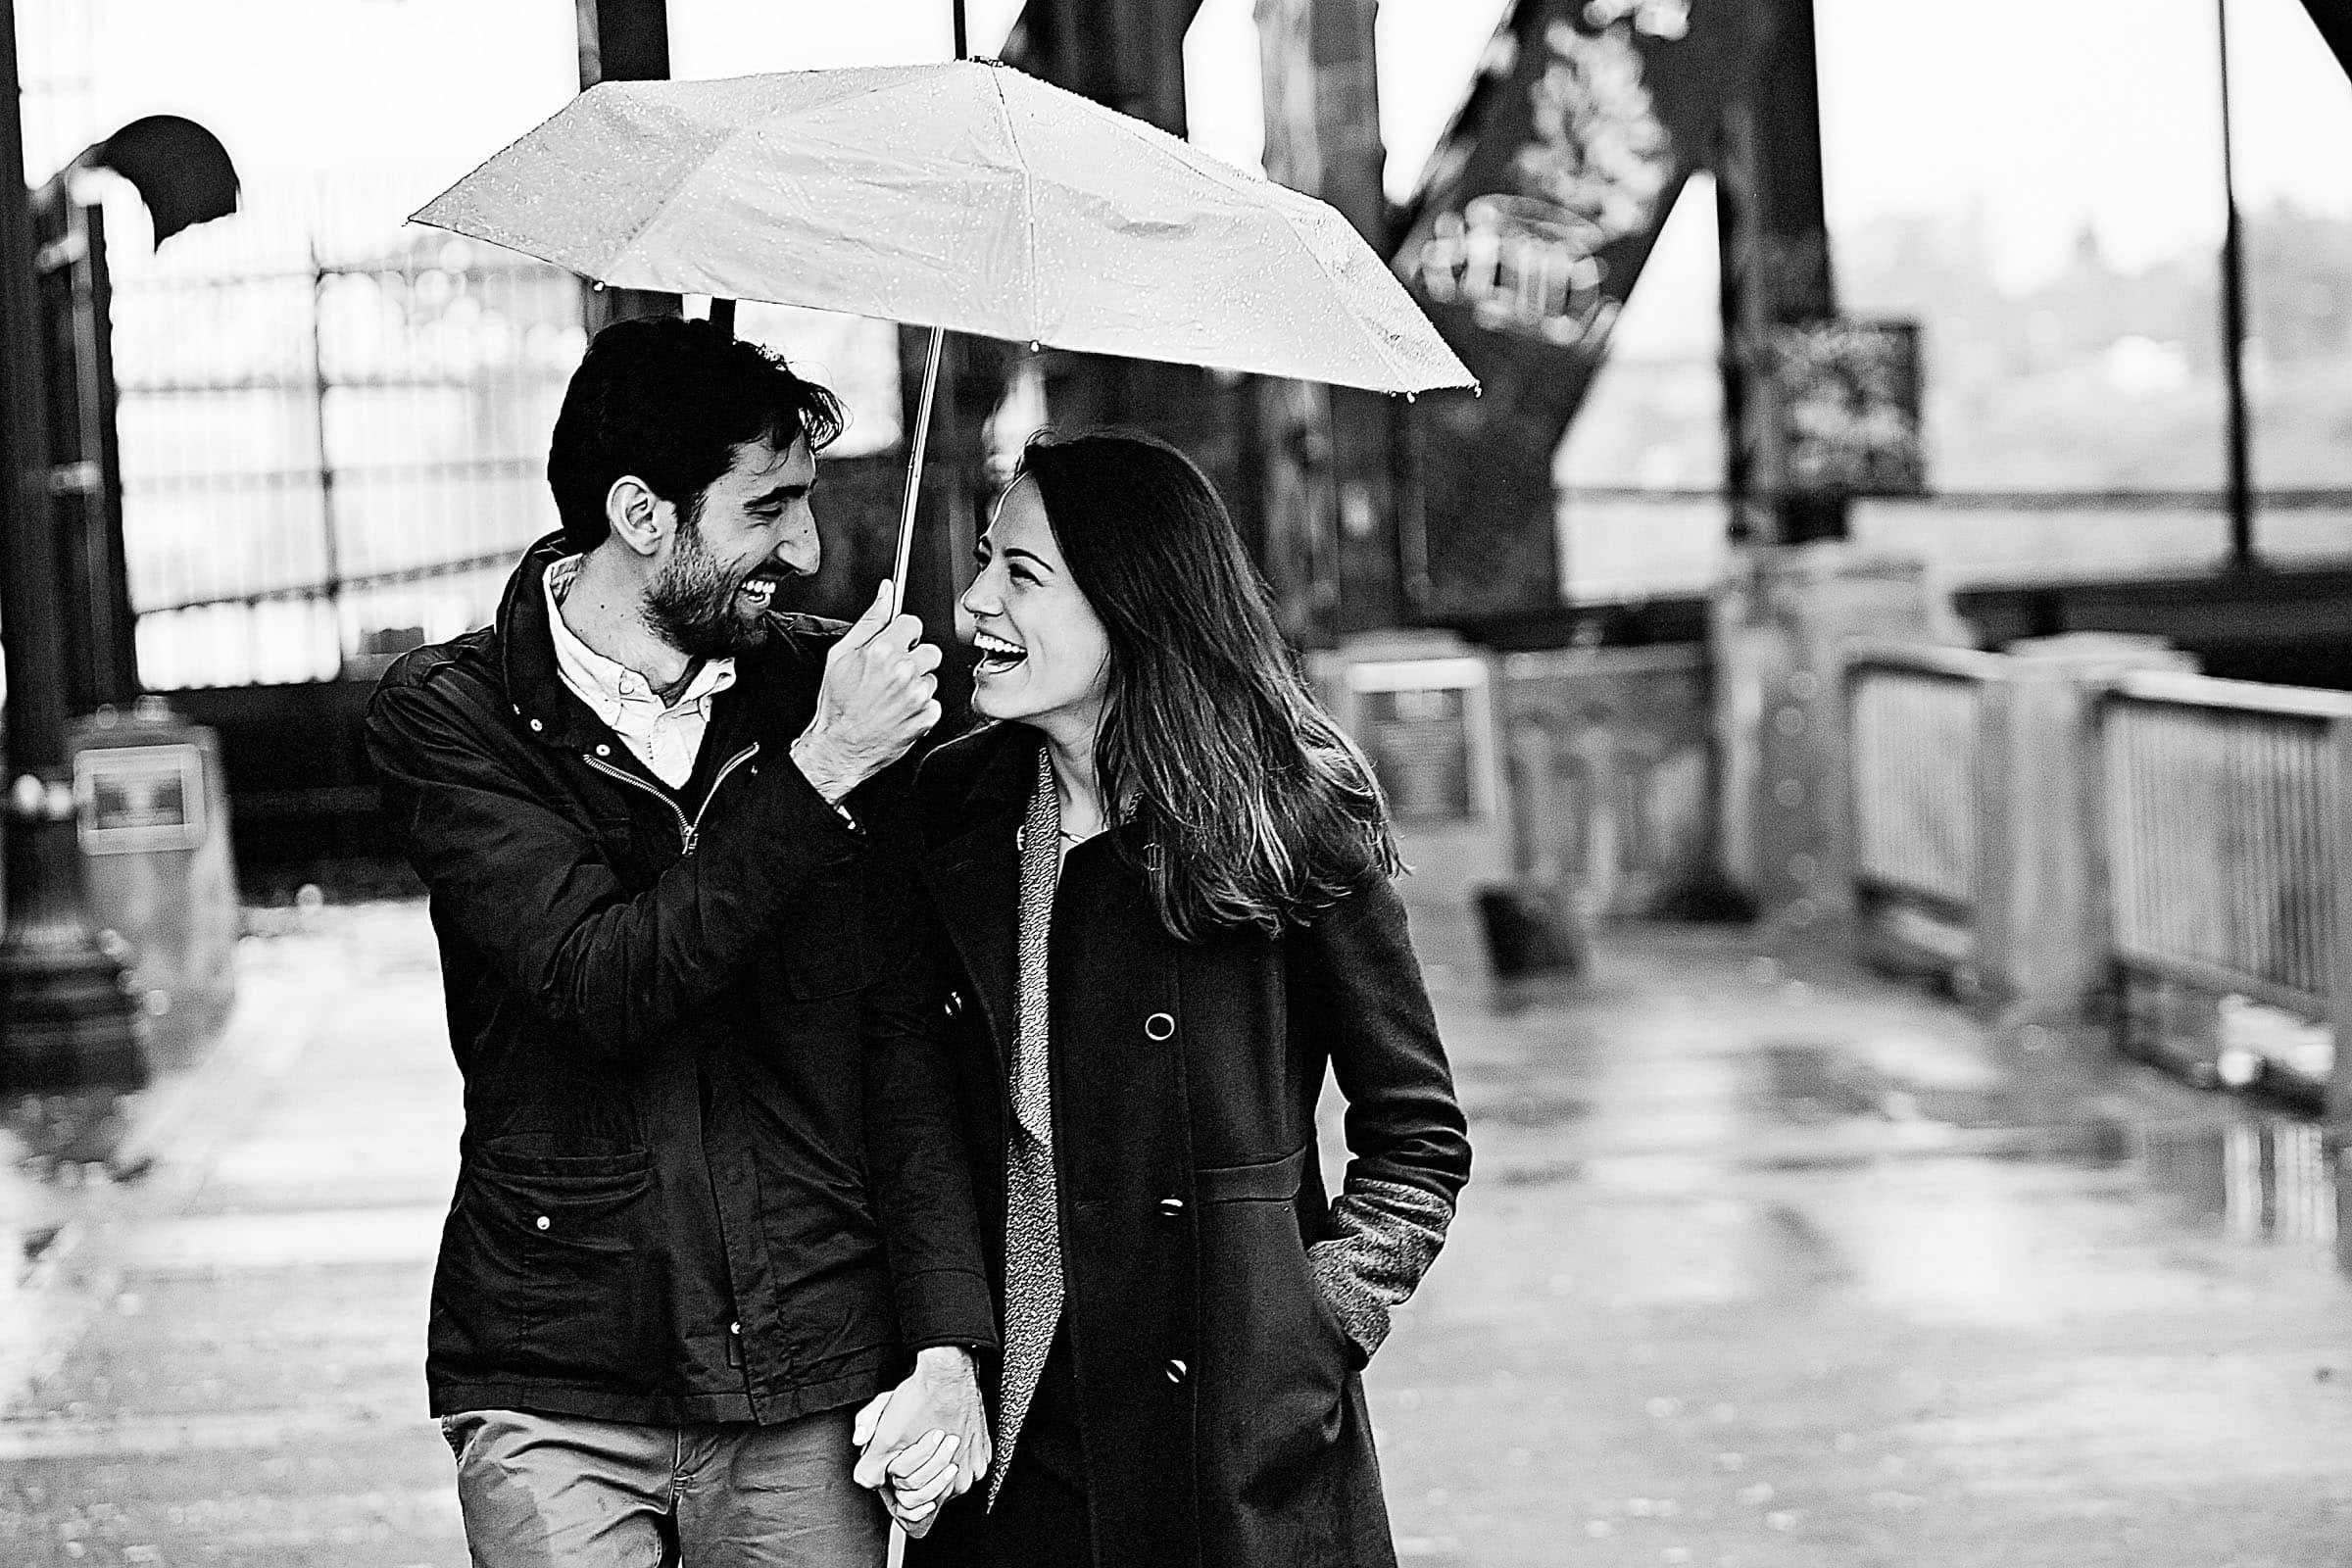 A fun walking Portland engagement proposal photo under an umbrella along the Portland waterfront park